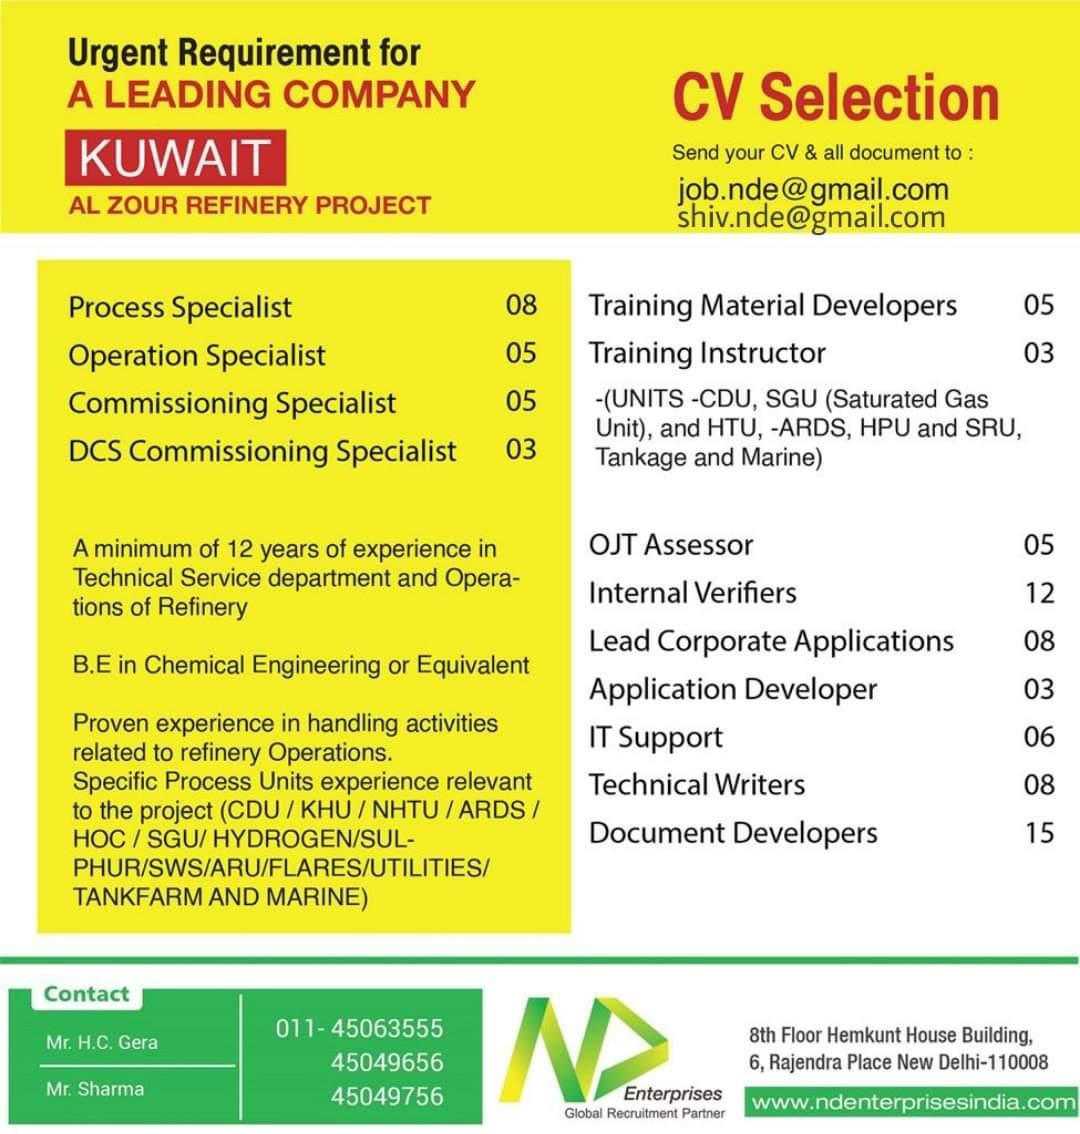 JOB OPPORTUNITIES IN GULF ENGINEERING COMPANY IN KUWAIT